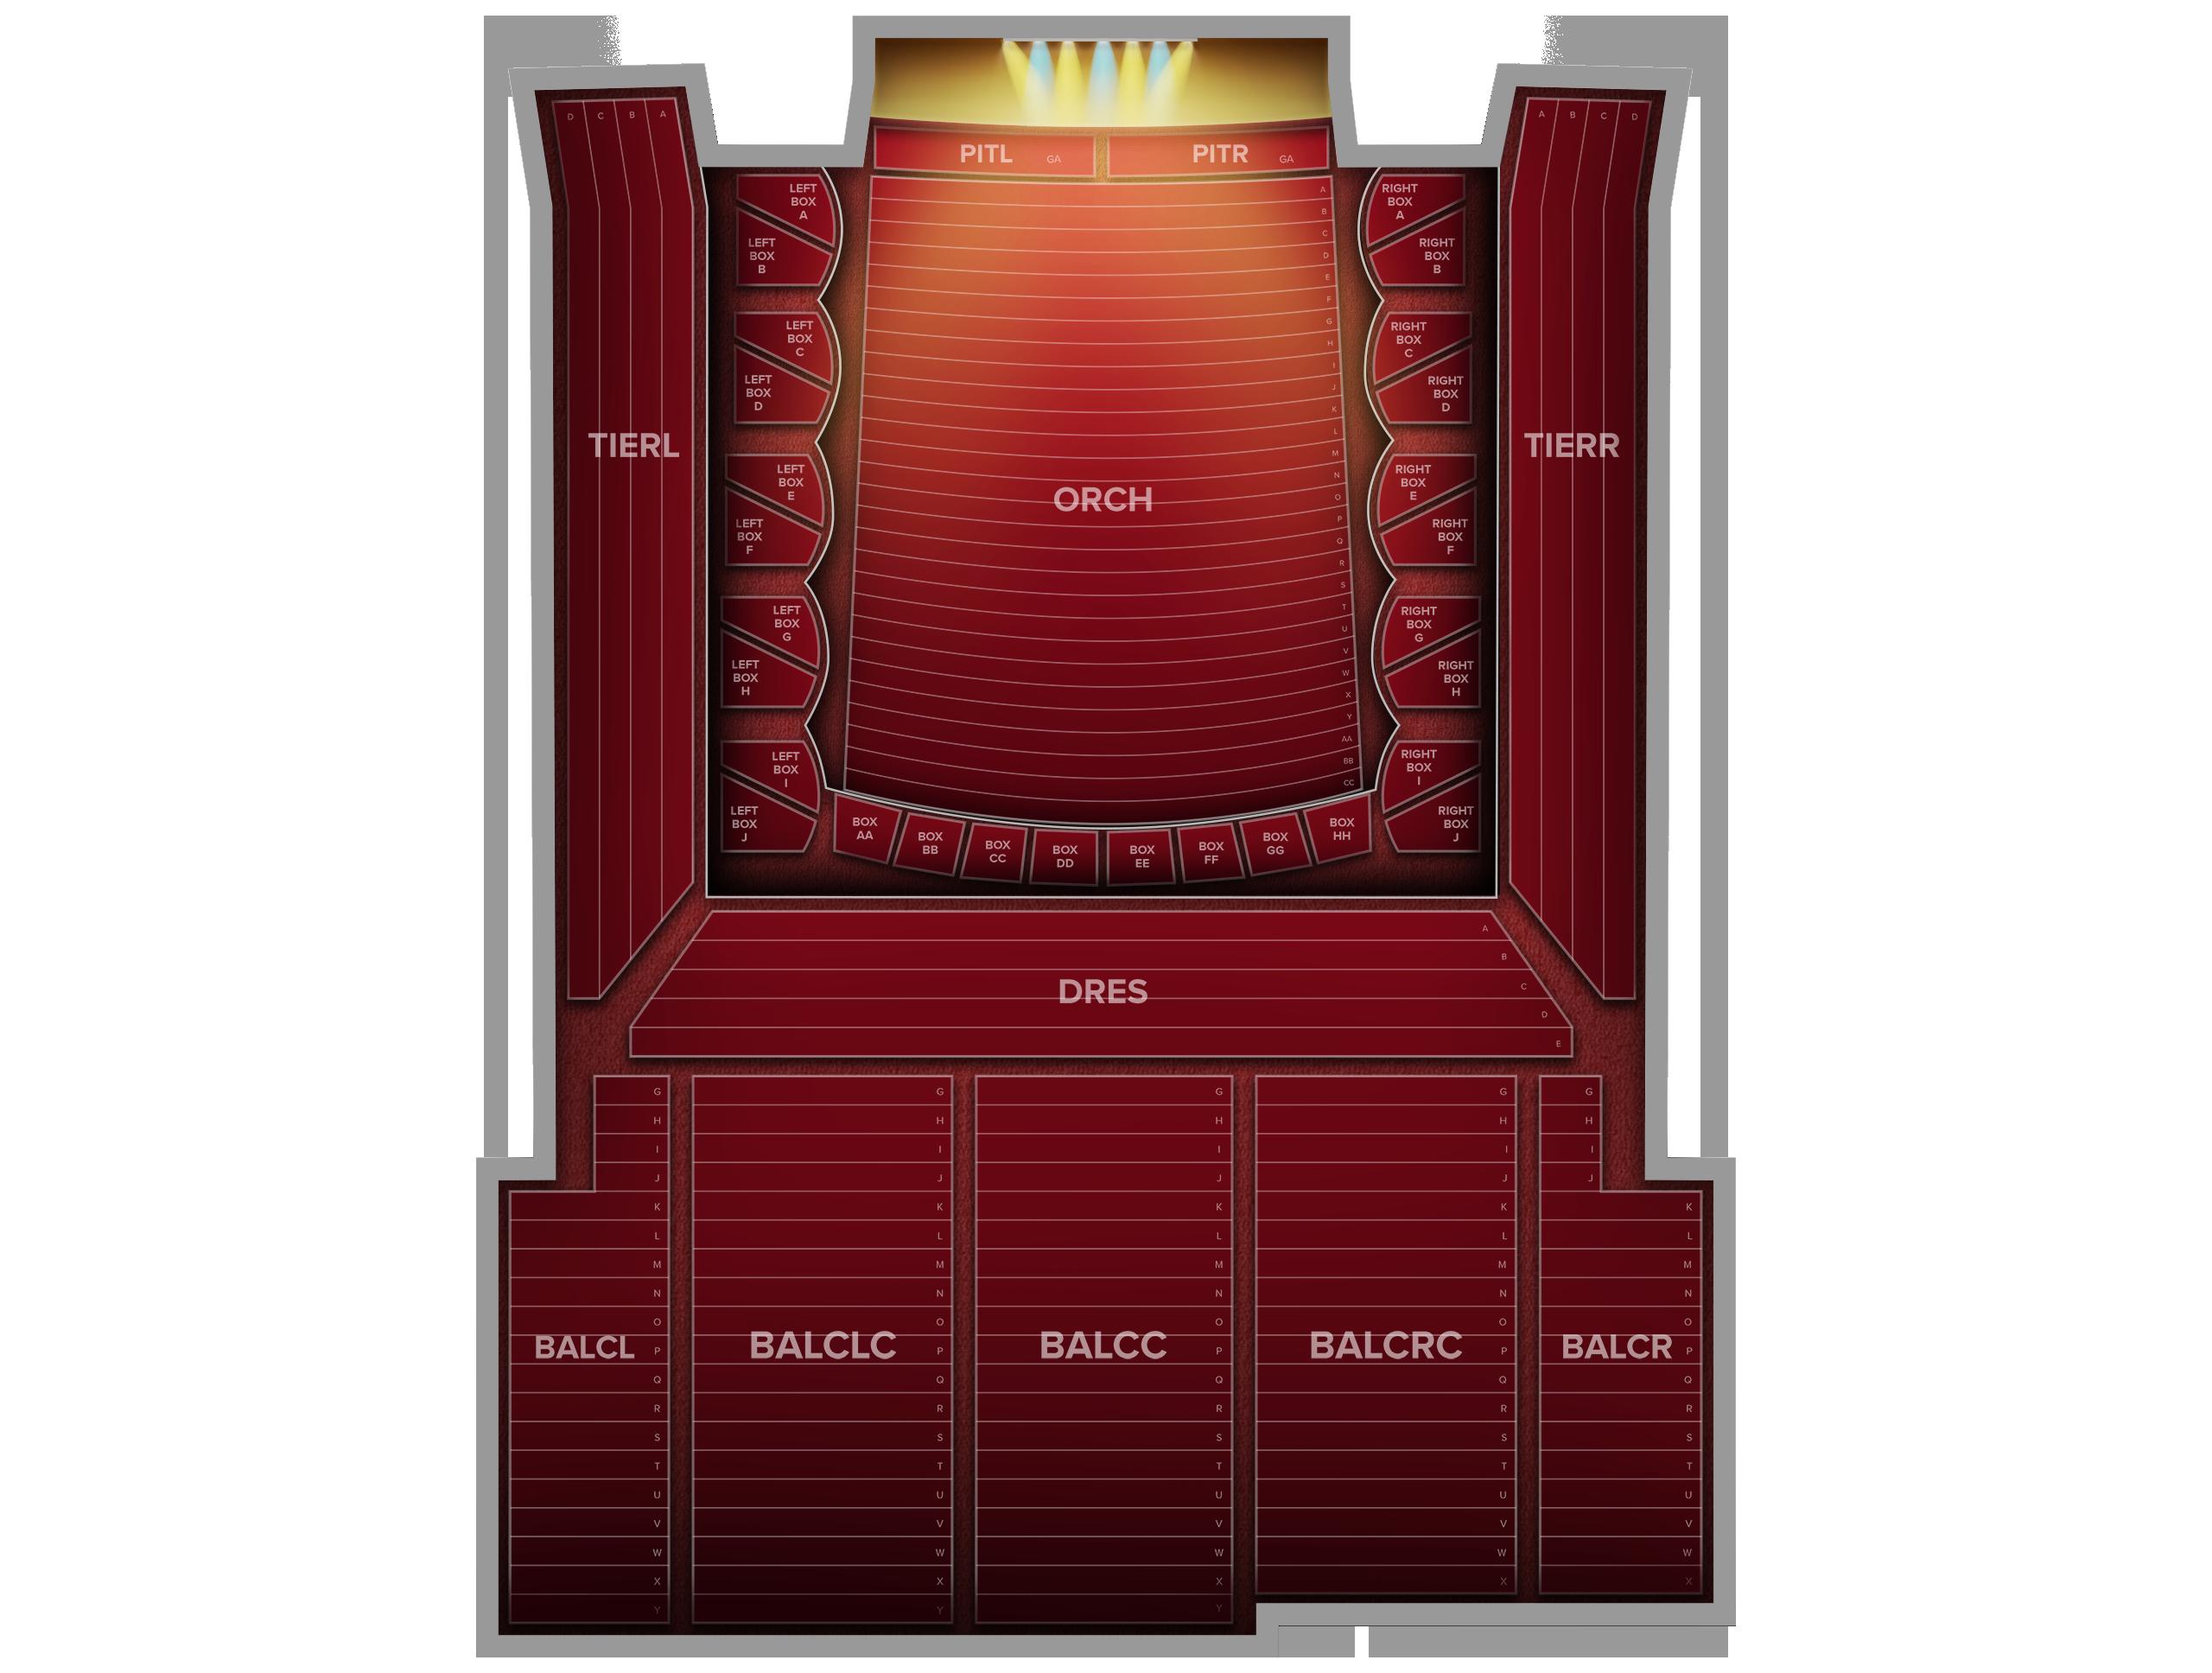 Modell Performing Arts Center Tickets